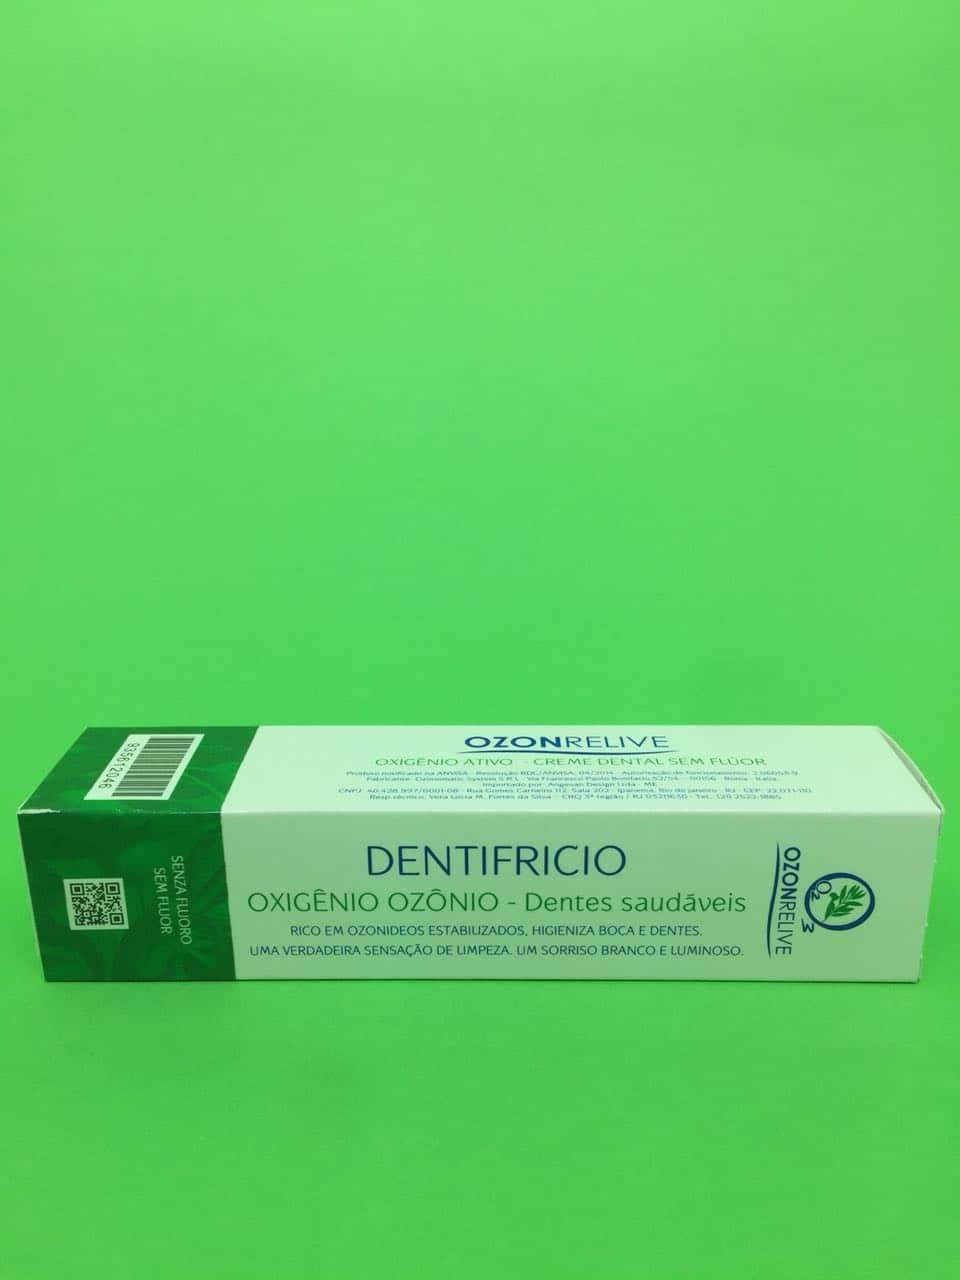 Ozonrelive Dentifricio 1